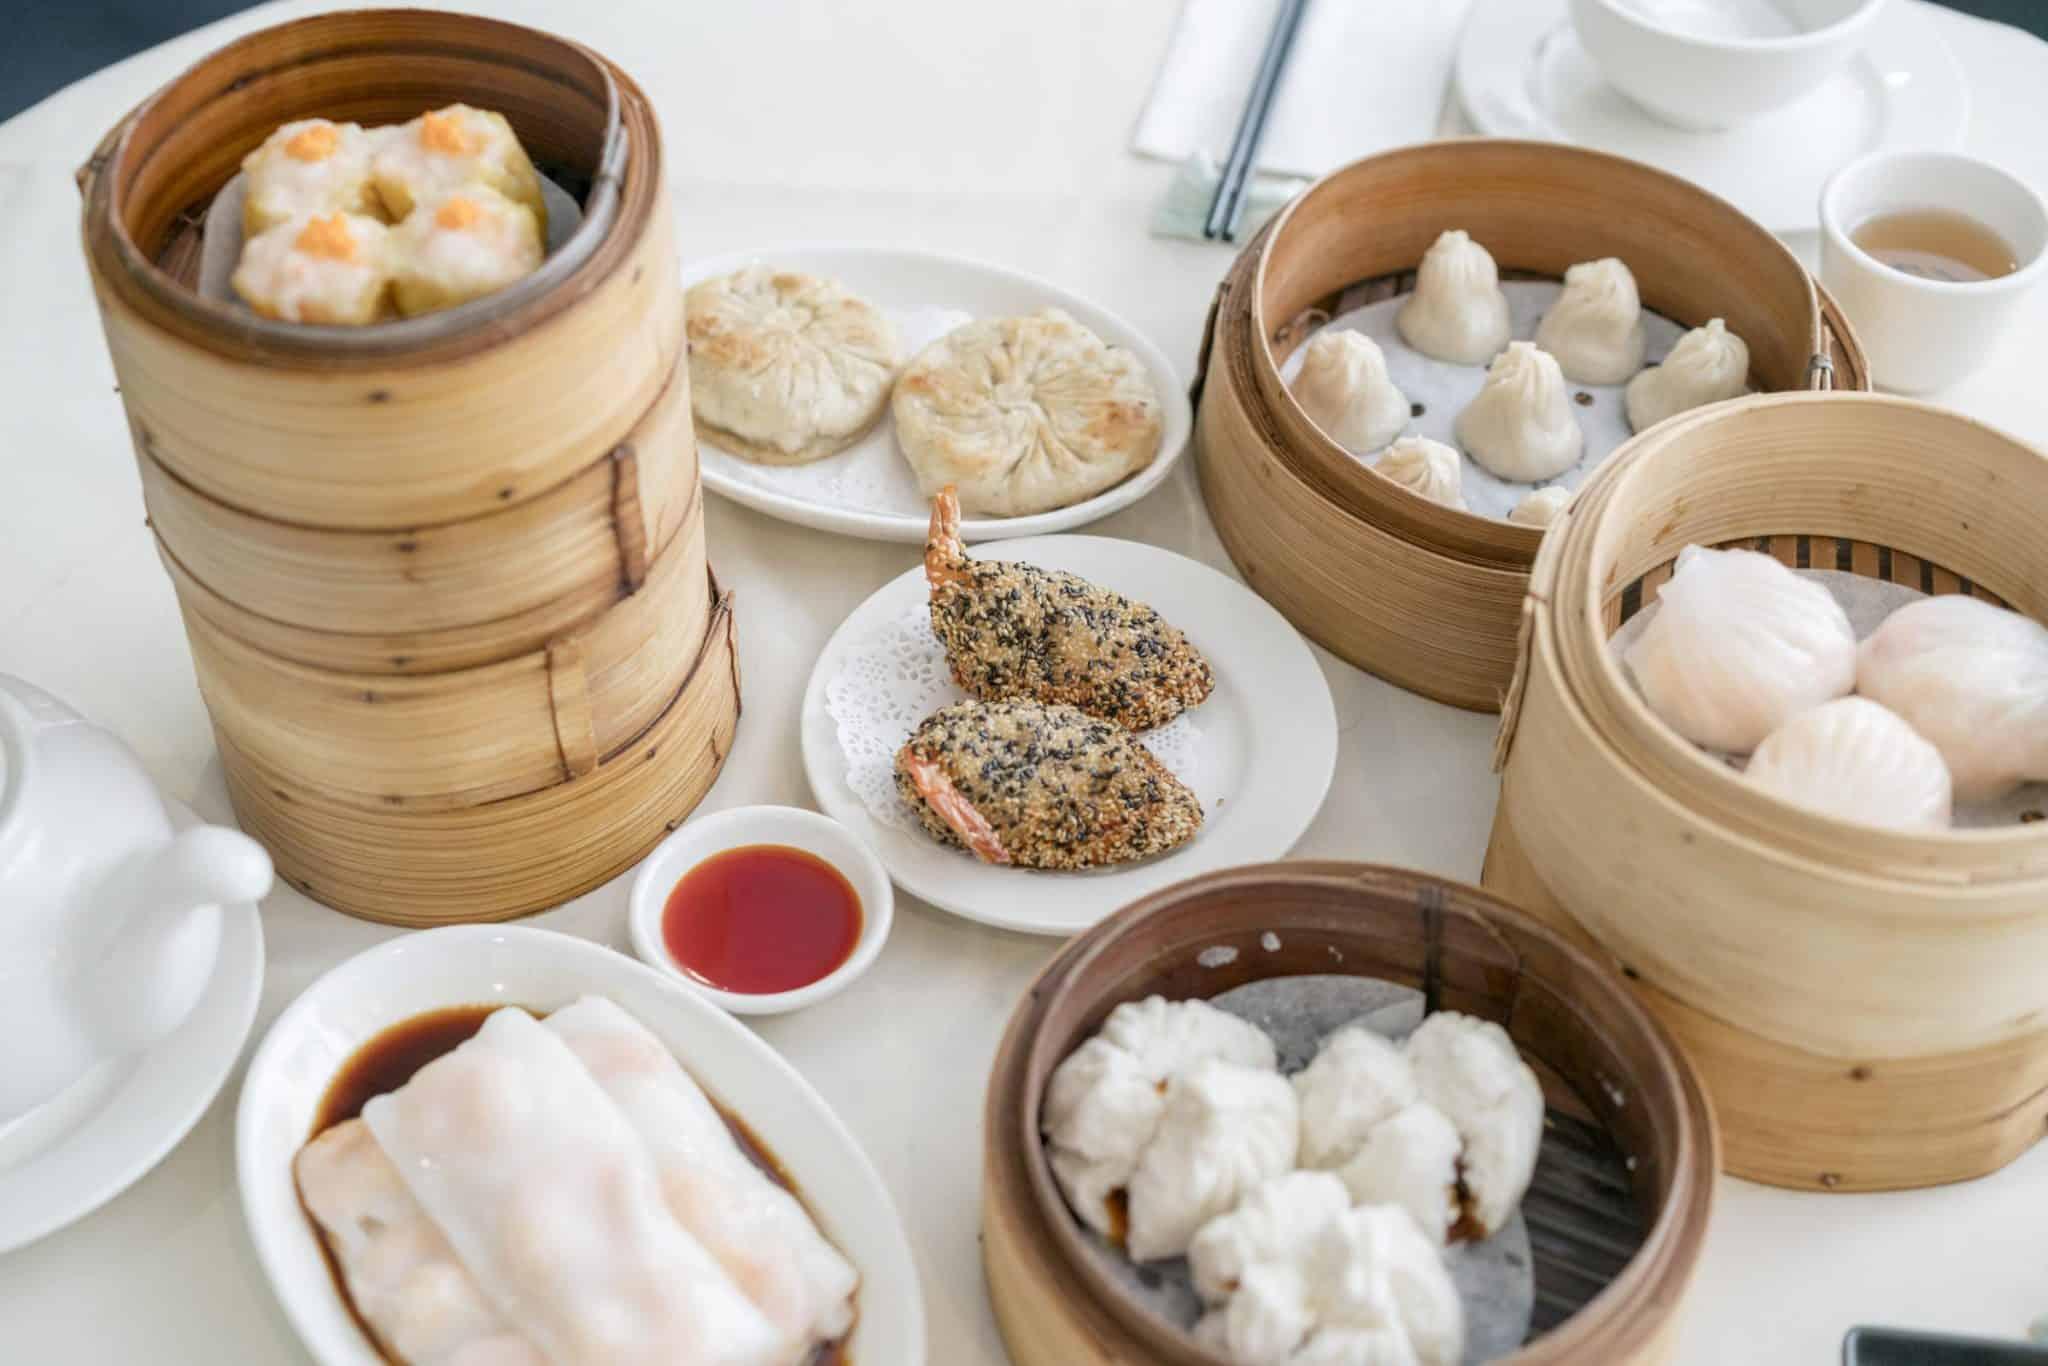 Dumplings' Legend Eat Out To Help Out